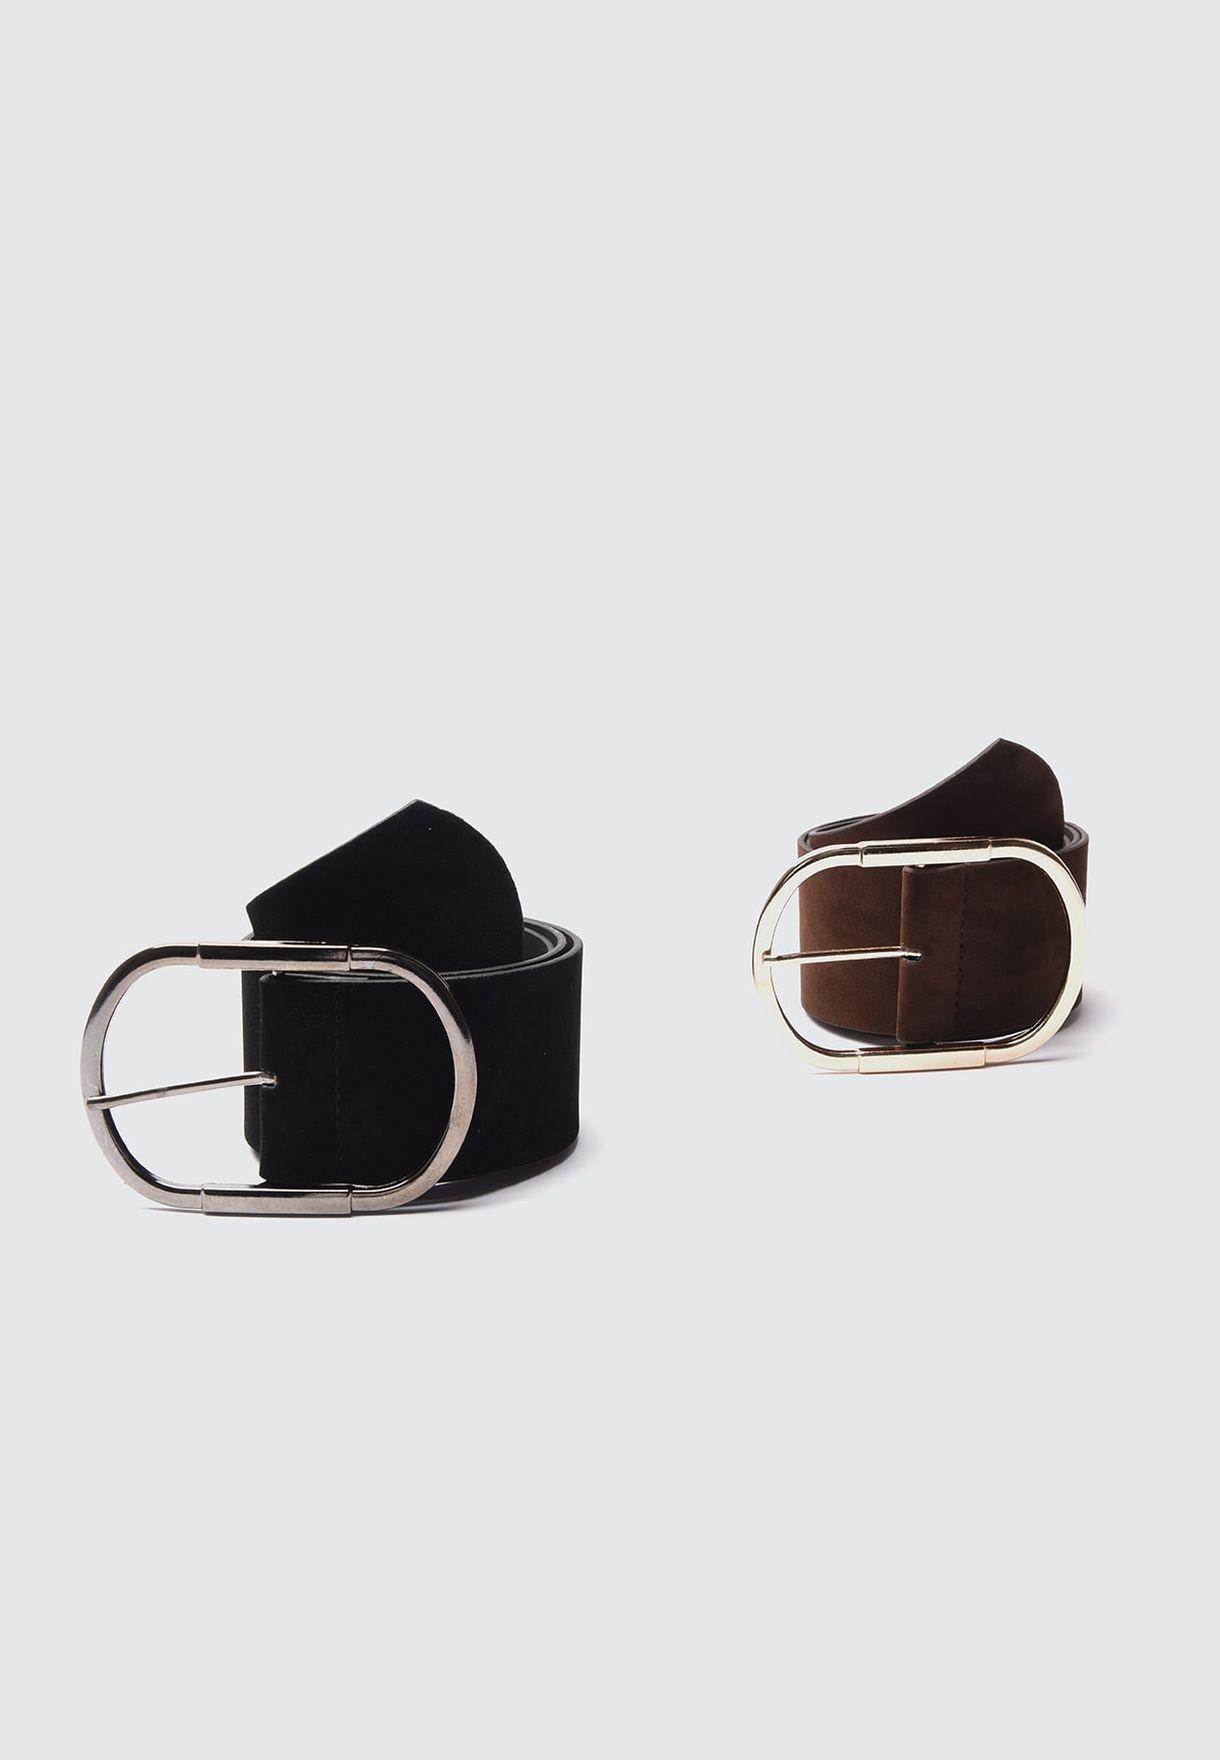 2-Pack Buckle Suede Belt